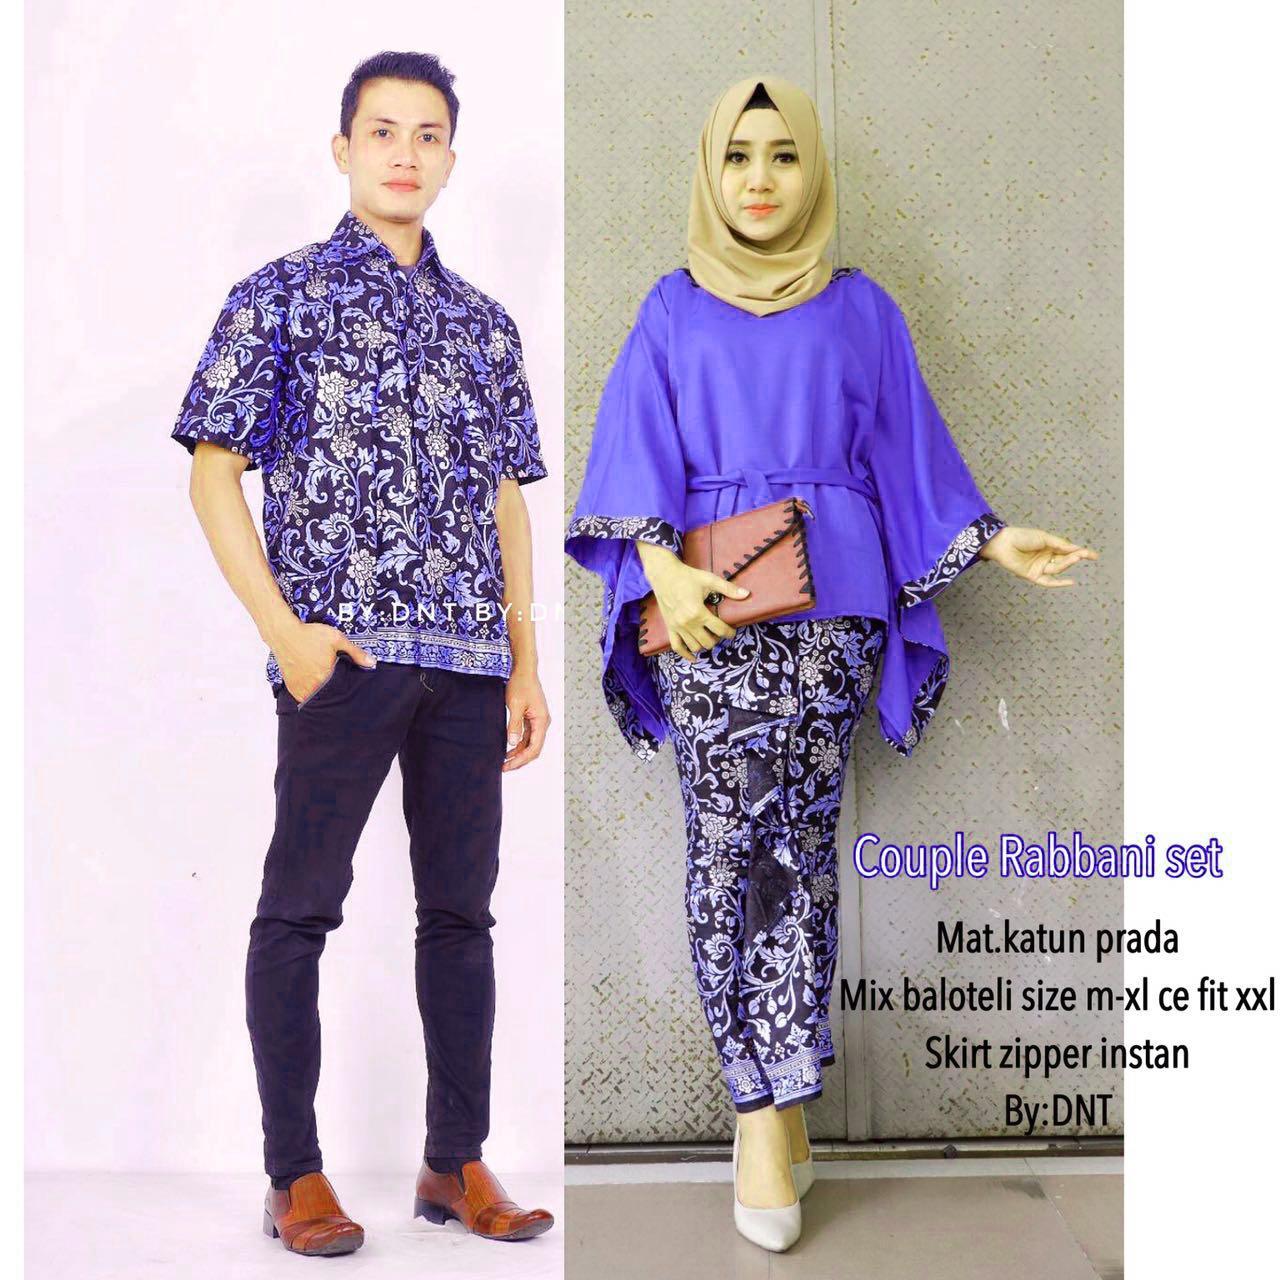 Likin Baju Batik / Batik Couple / Batik Sarimbit / Batik Pesta / Batik Keluarga Rabbani Couple